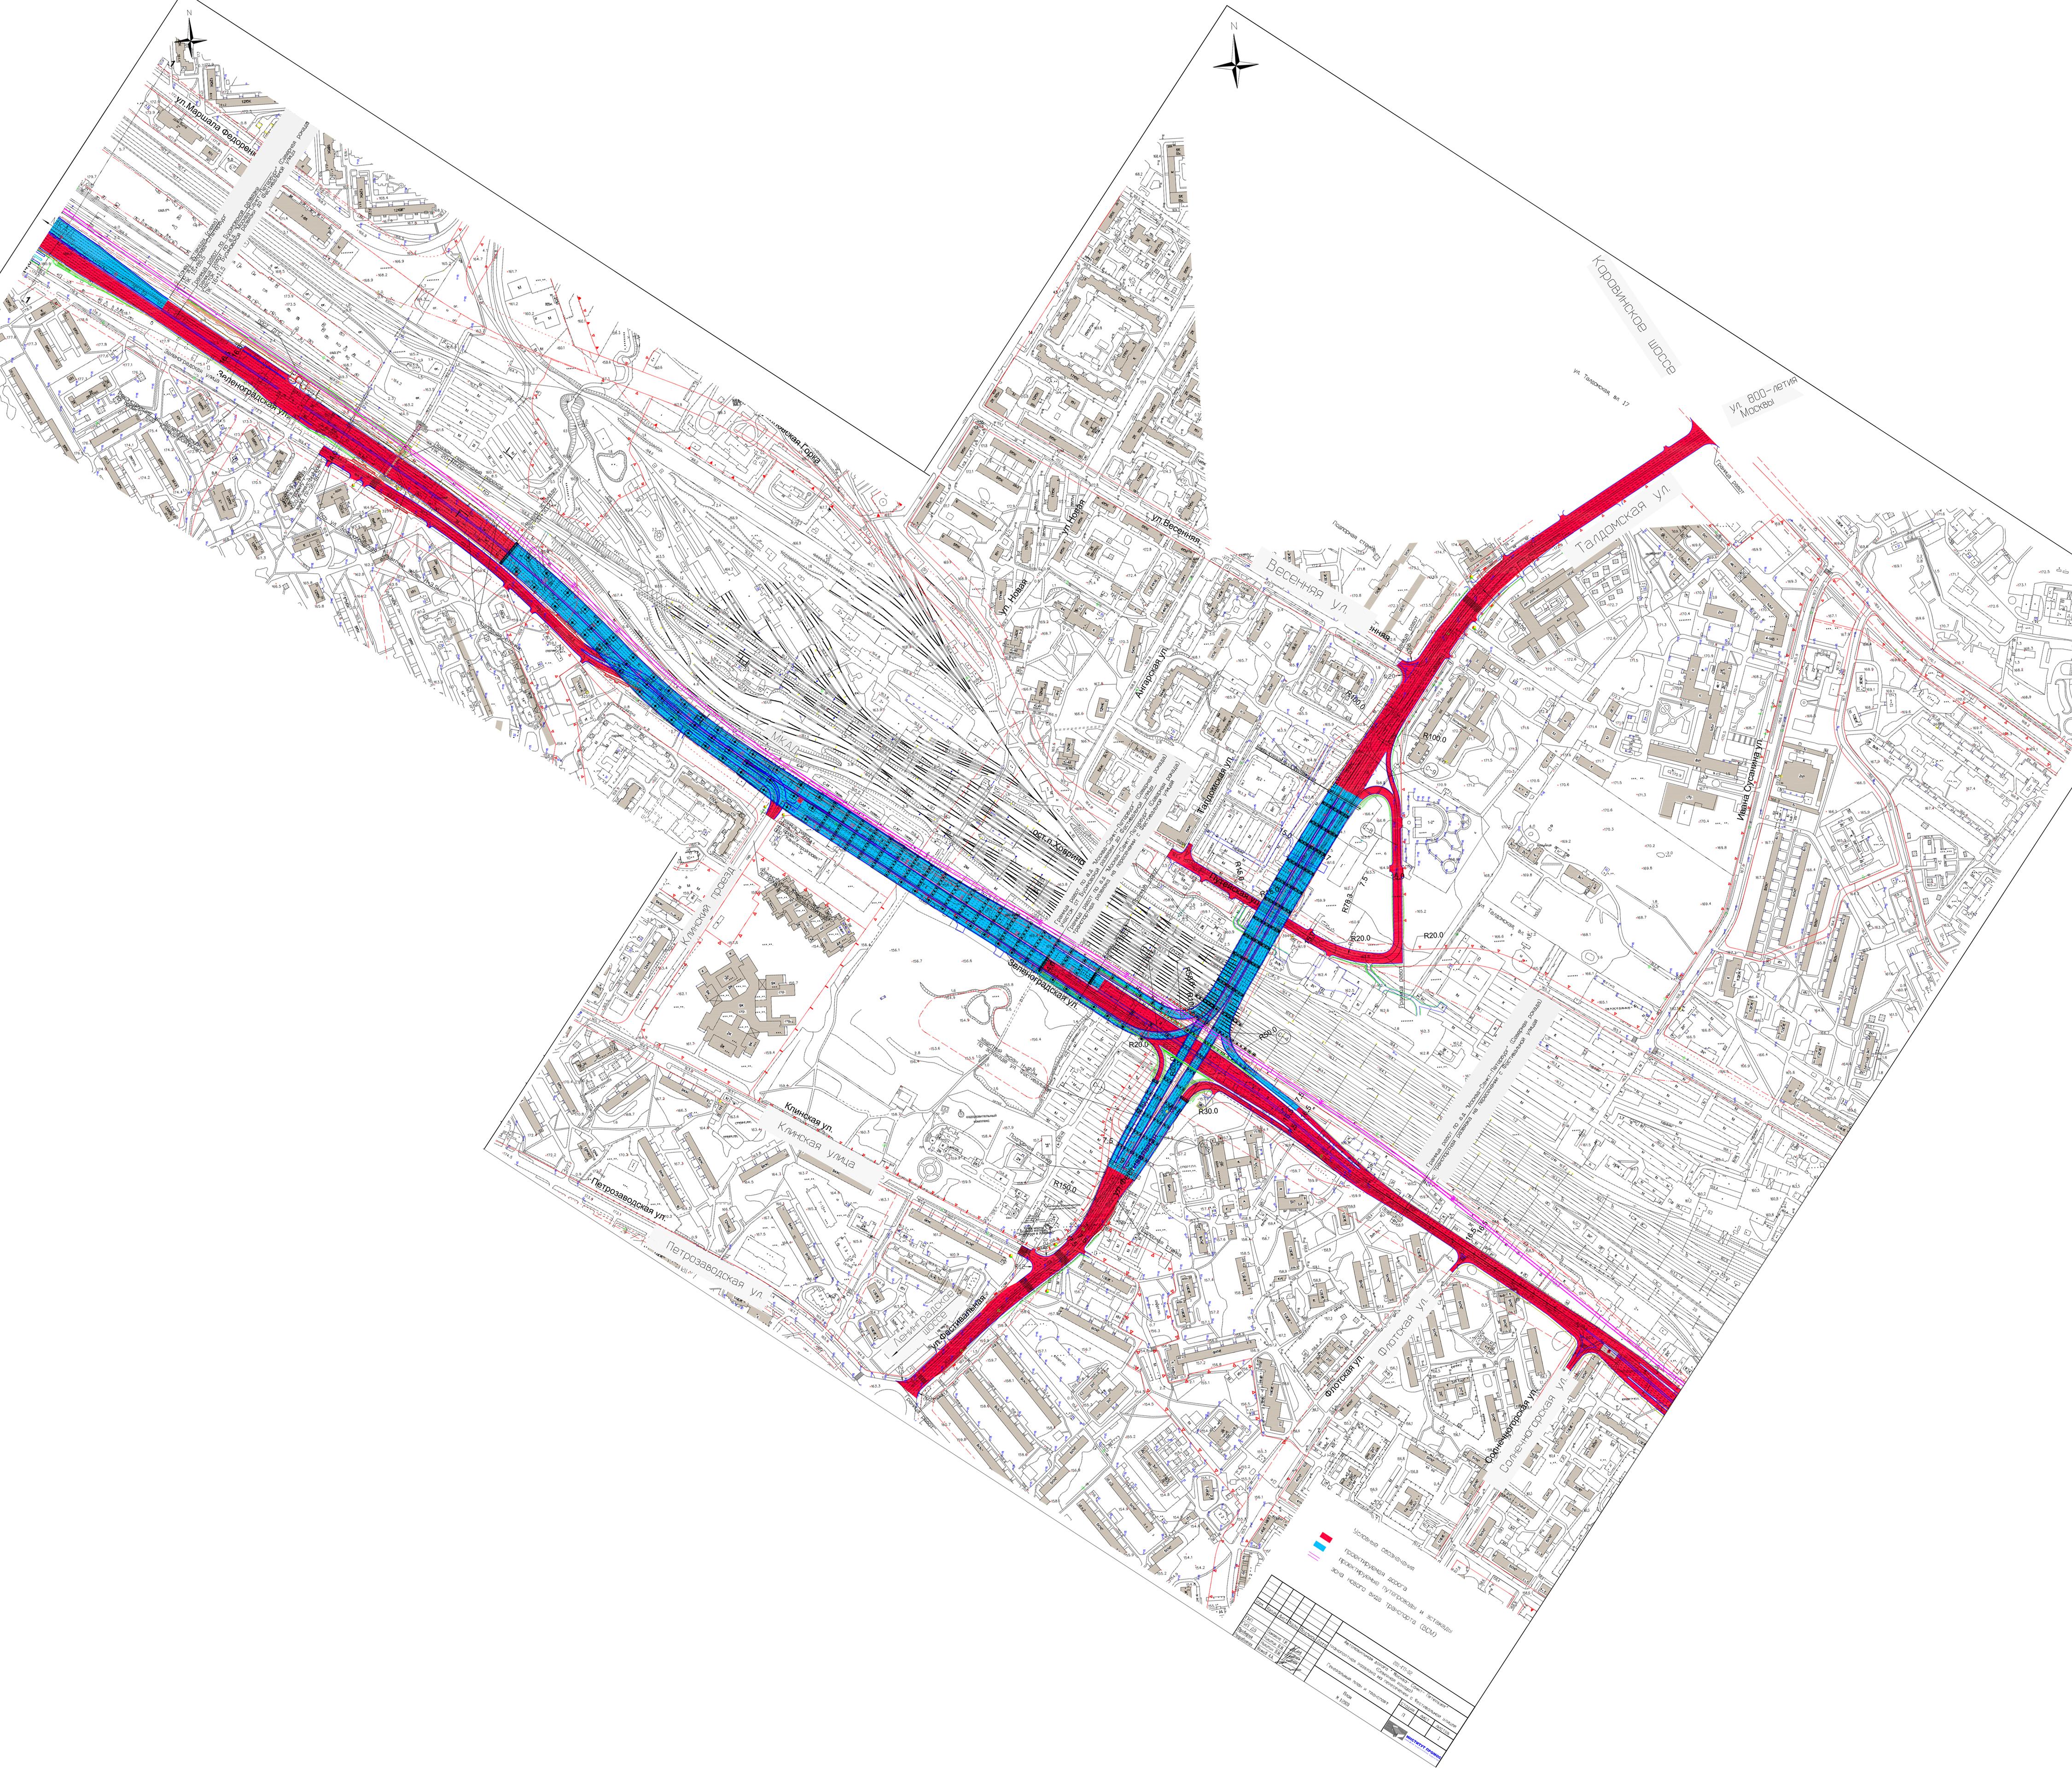 Развязка на зеленоградской улице схема